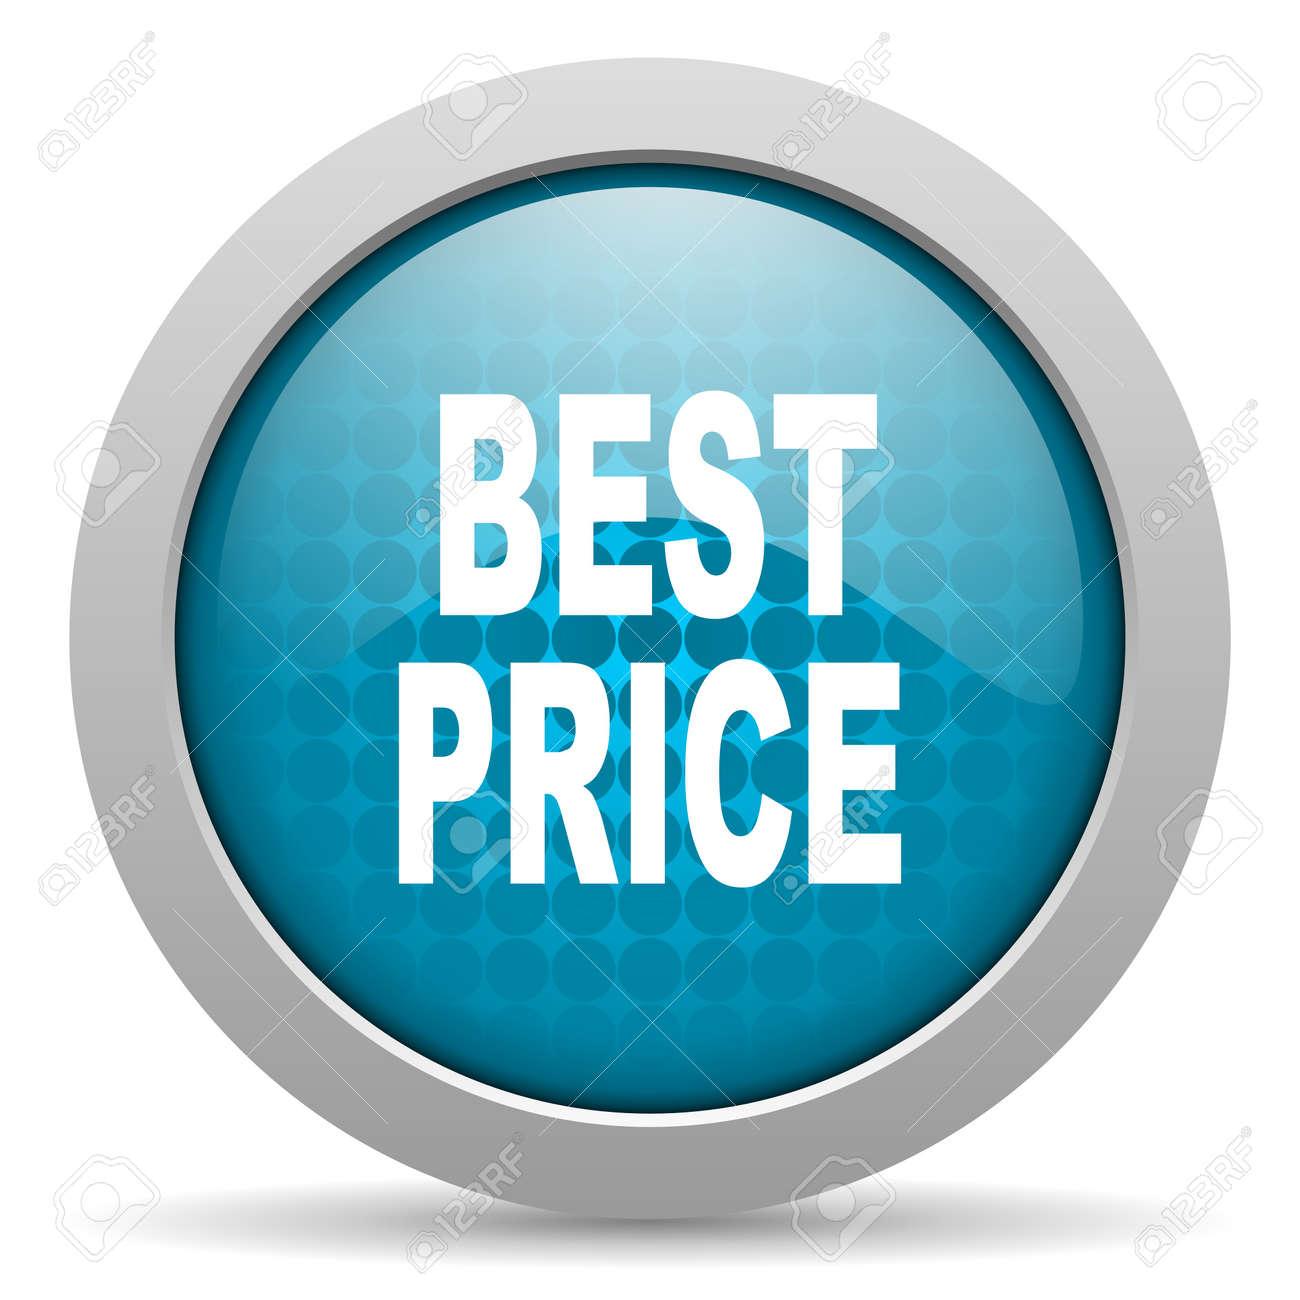 best price blue circle web glossy icon Stock Photo - 19348227